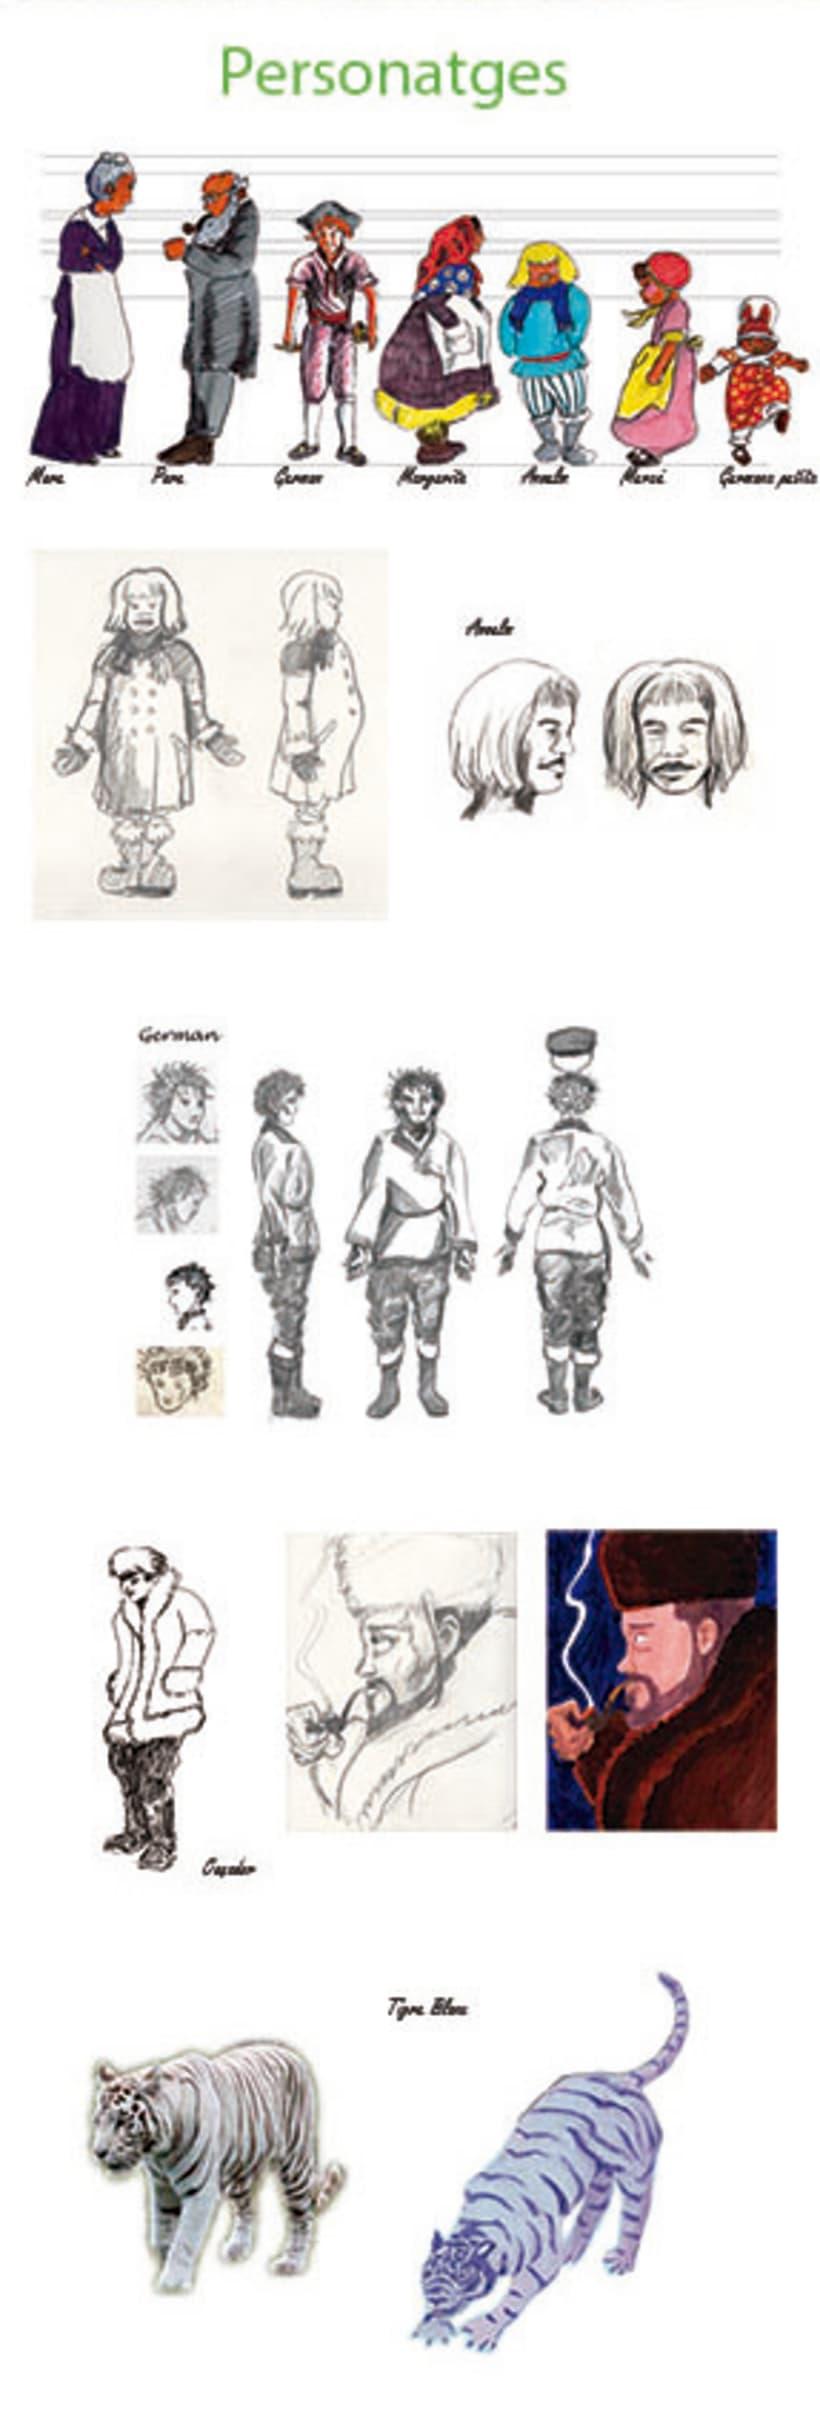 """LA PARTIDA"", historieta gràfica. PINTURA ACRÍLICA 0"